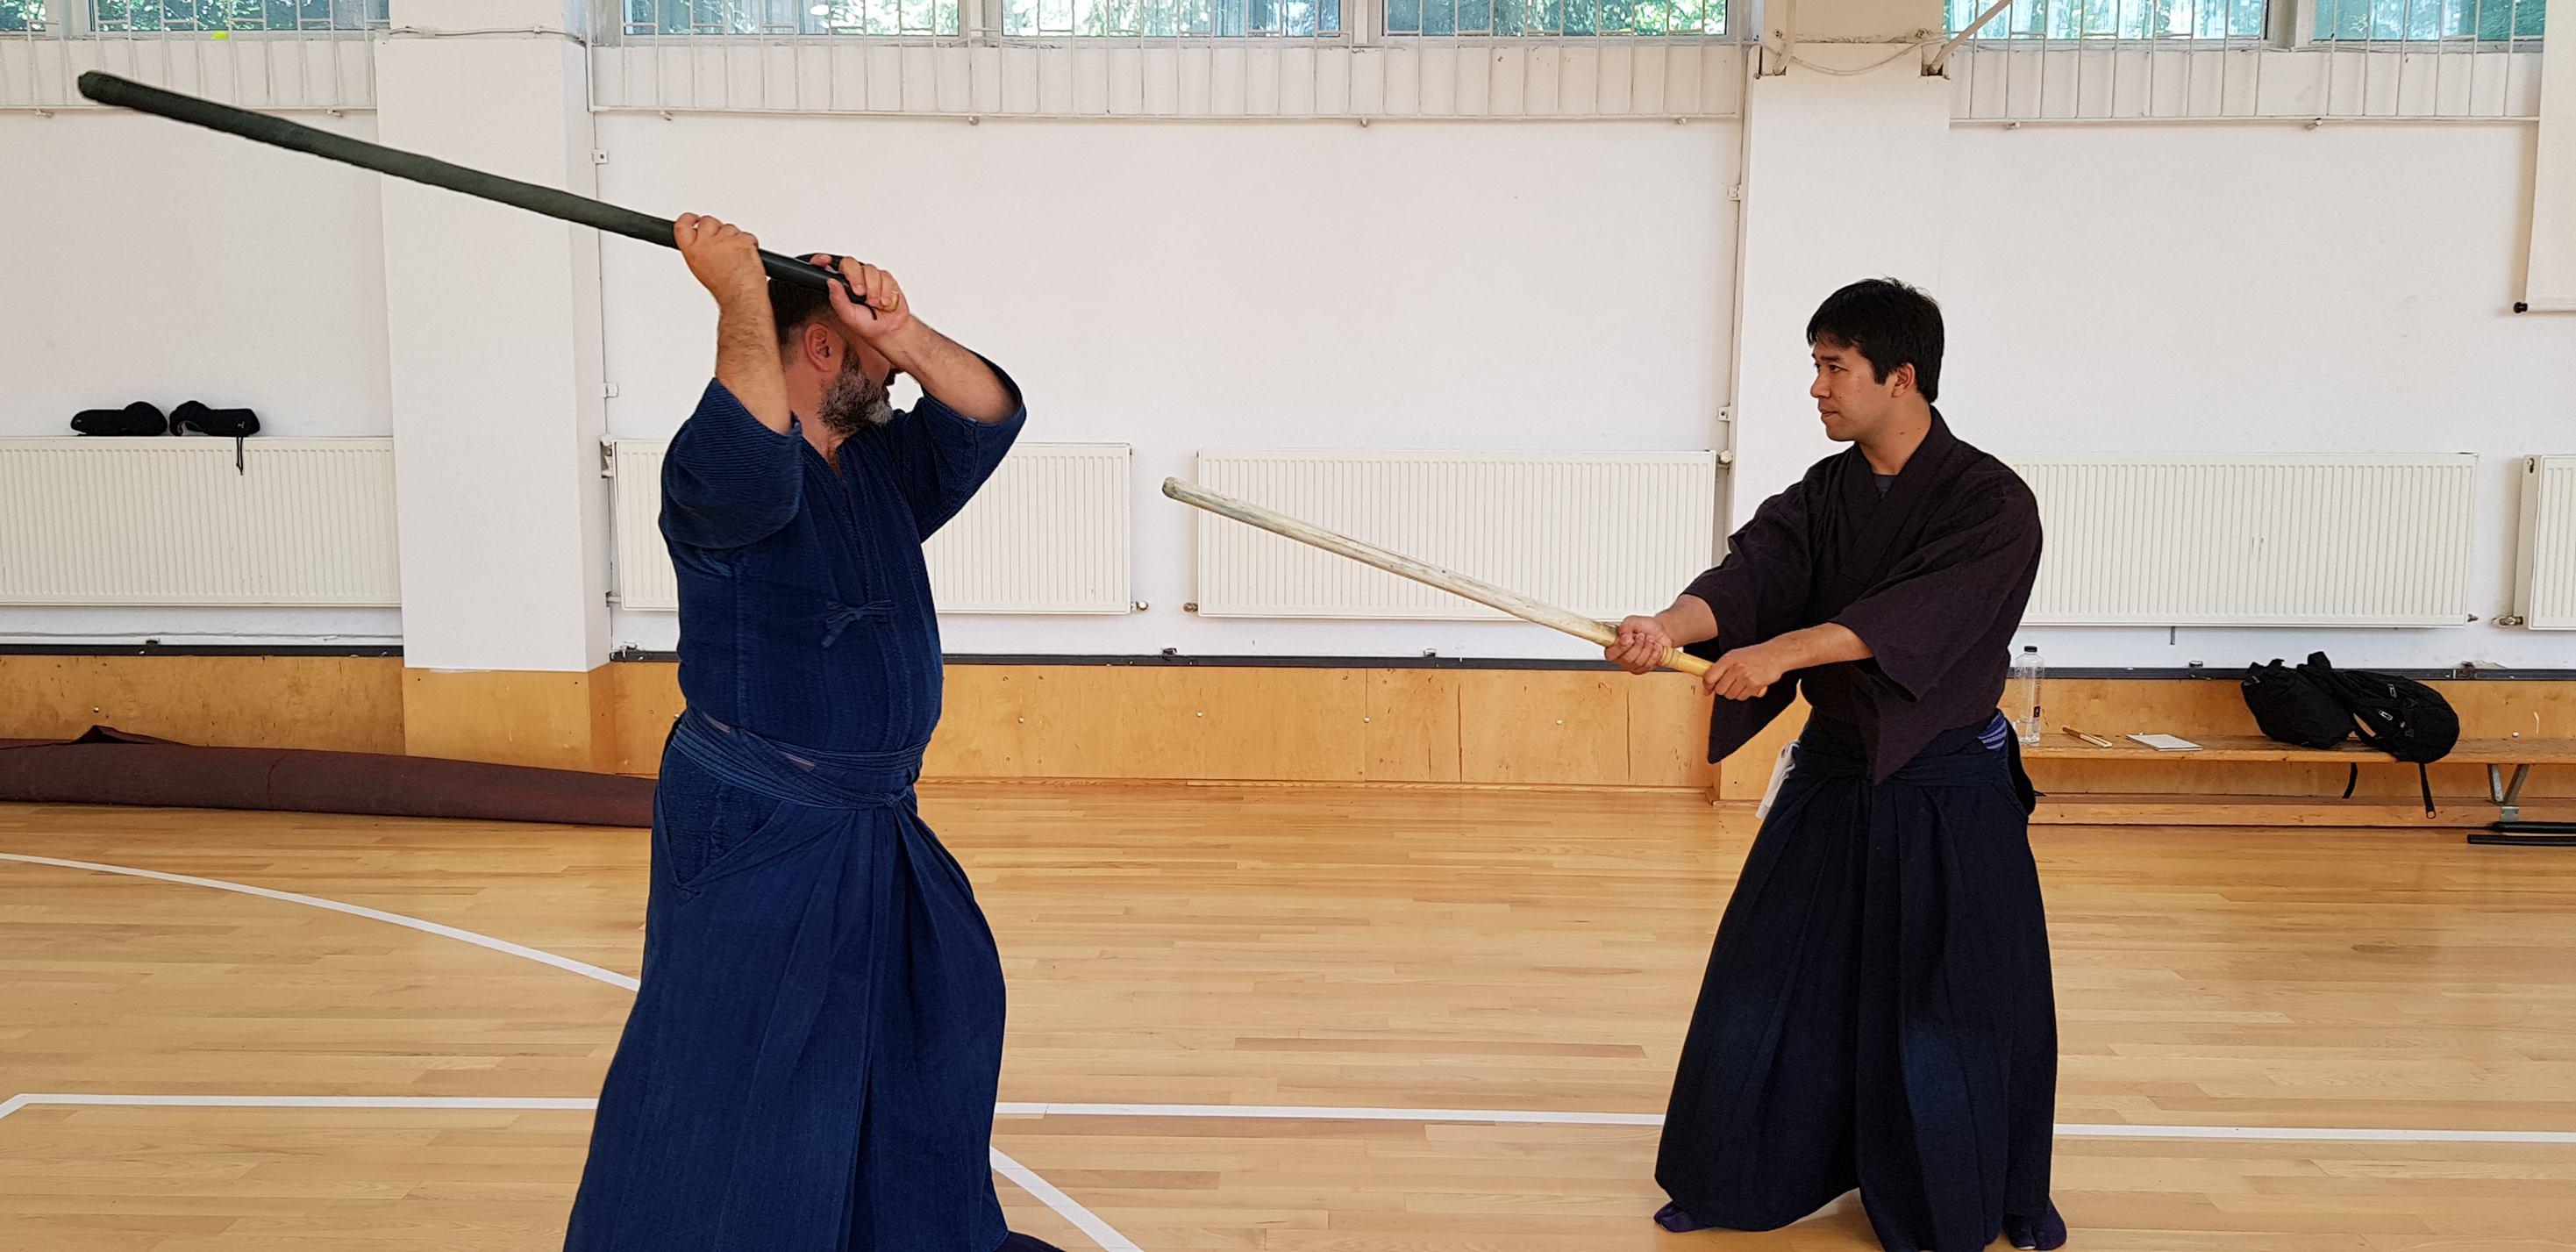 Takanashi Takara and Dragos Chiric